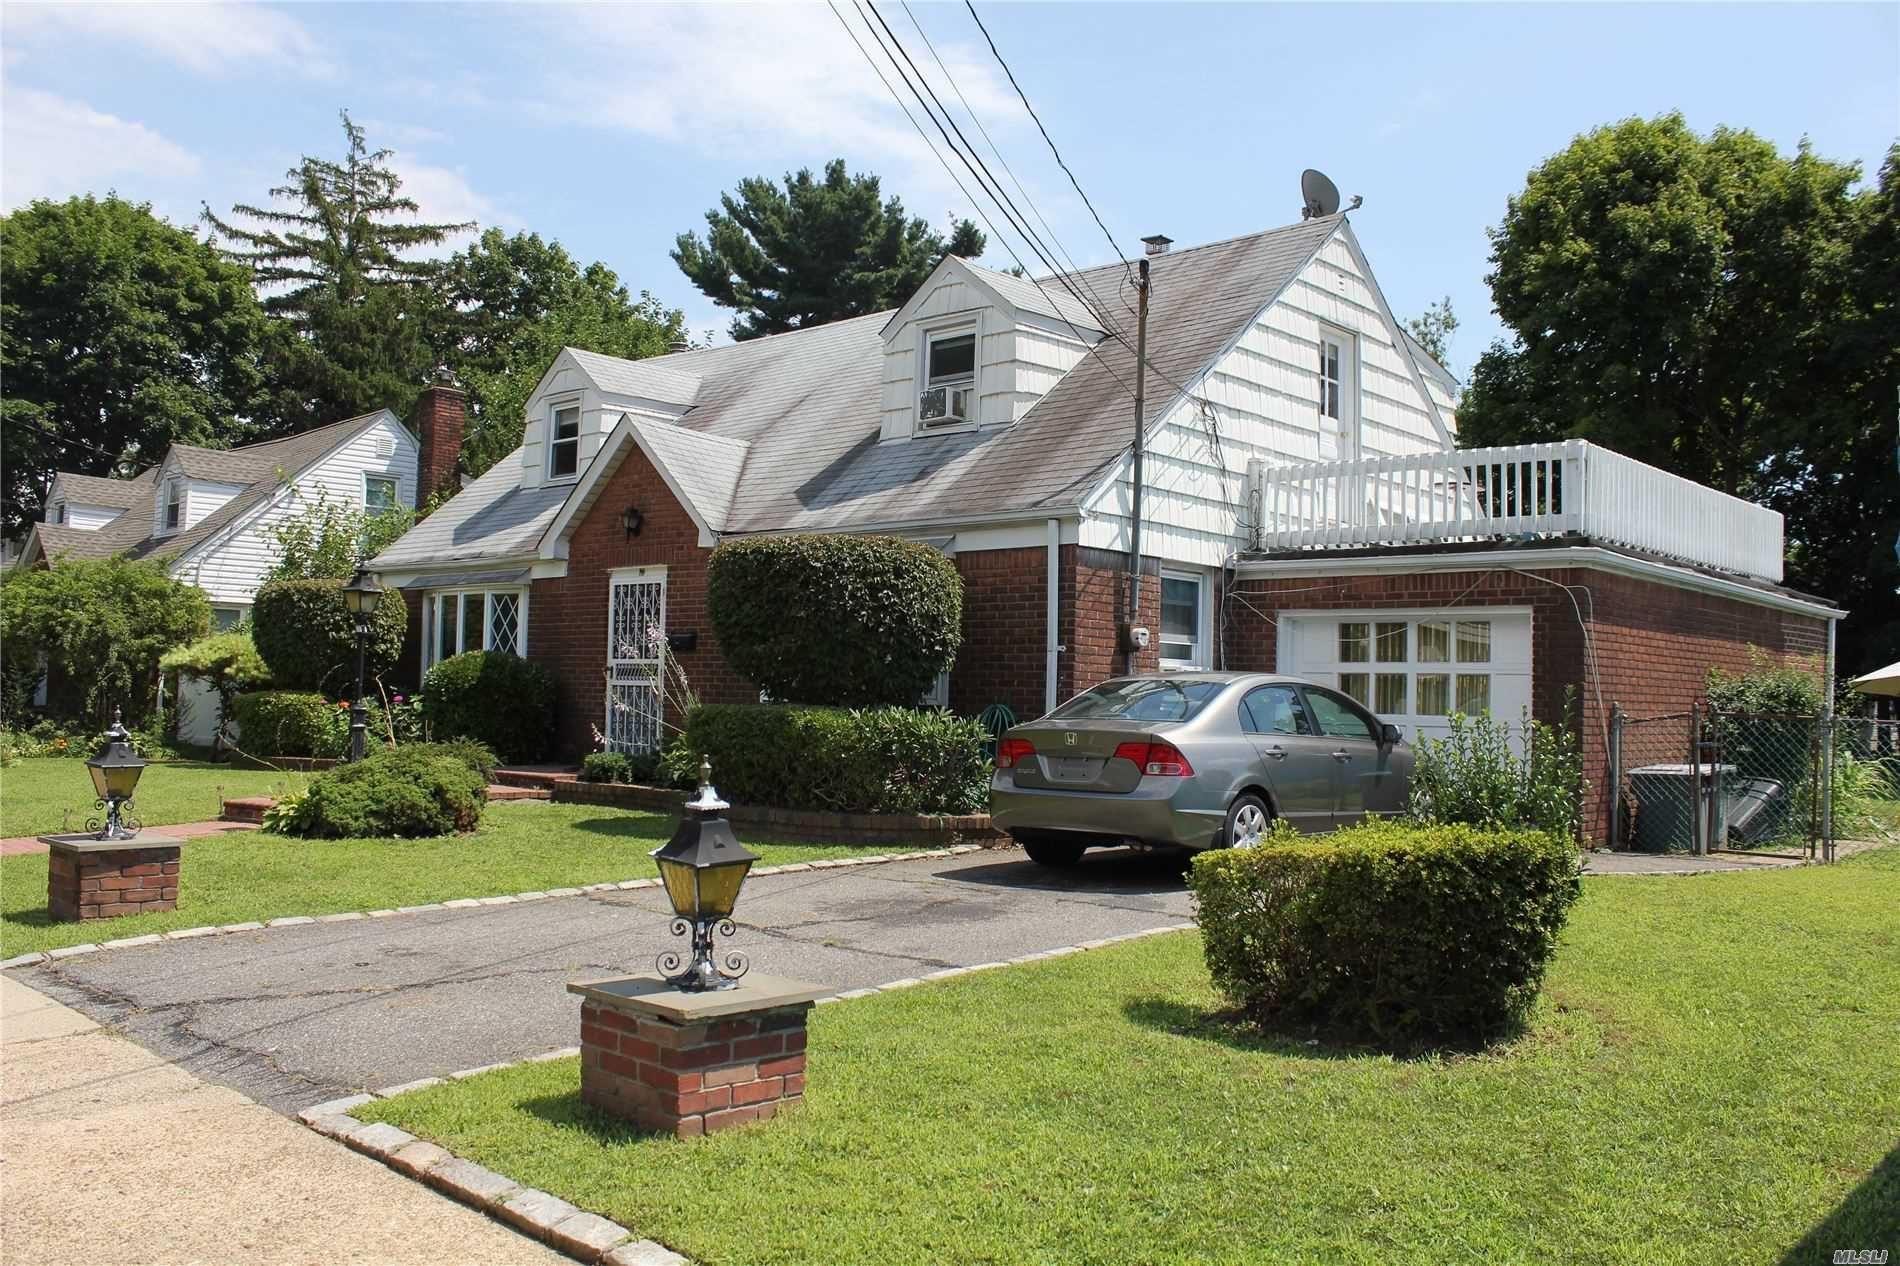 20 Sterling Pl, Hempstead, NY 11550 - MLS#: 3238948